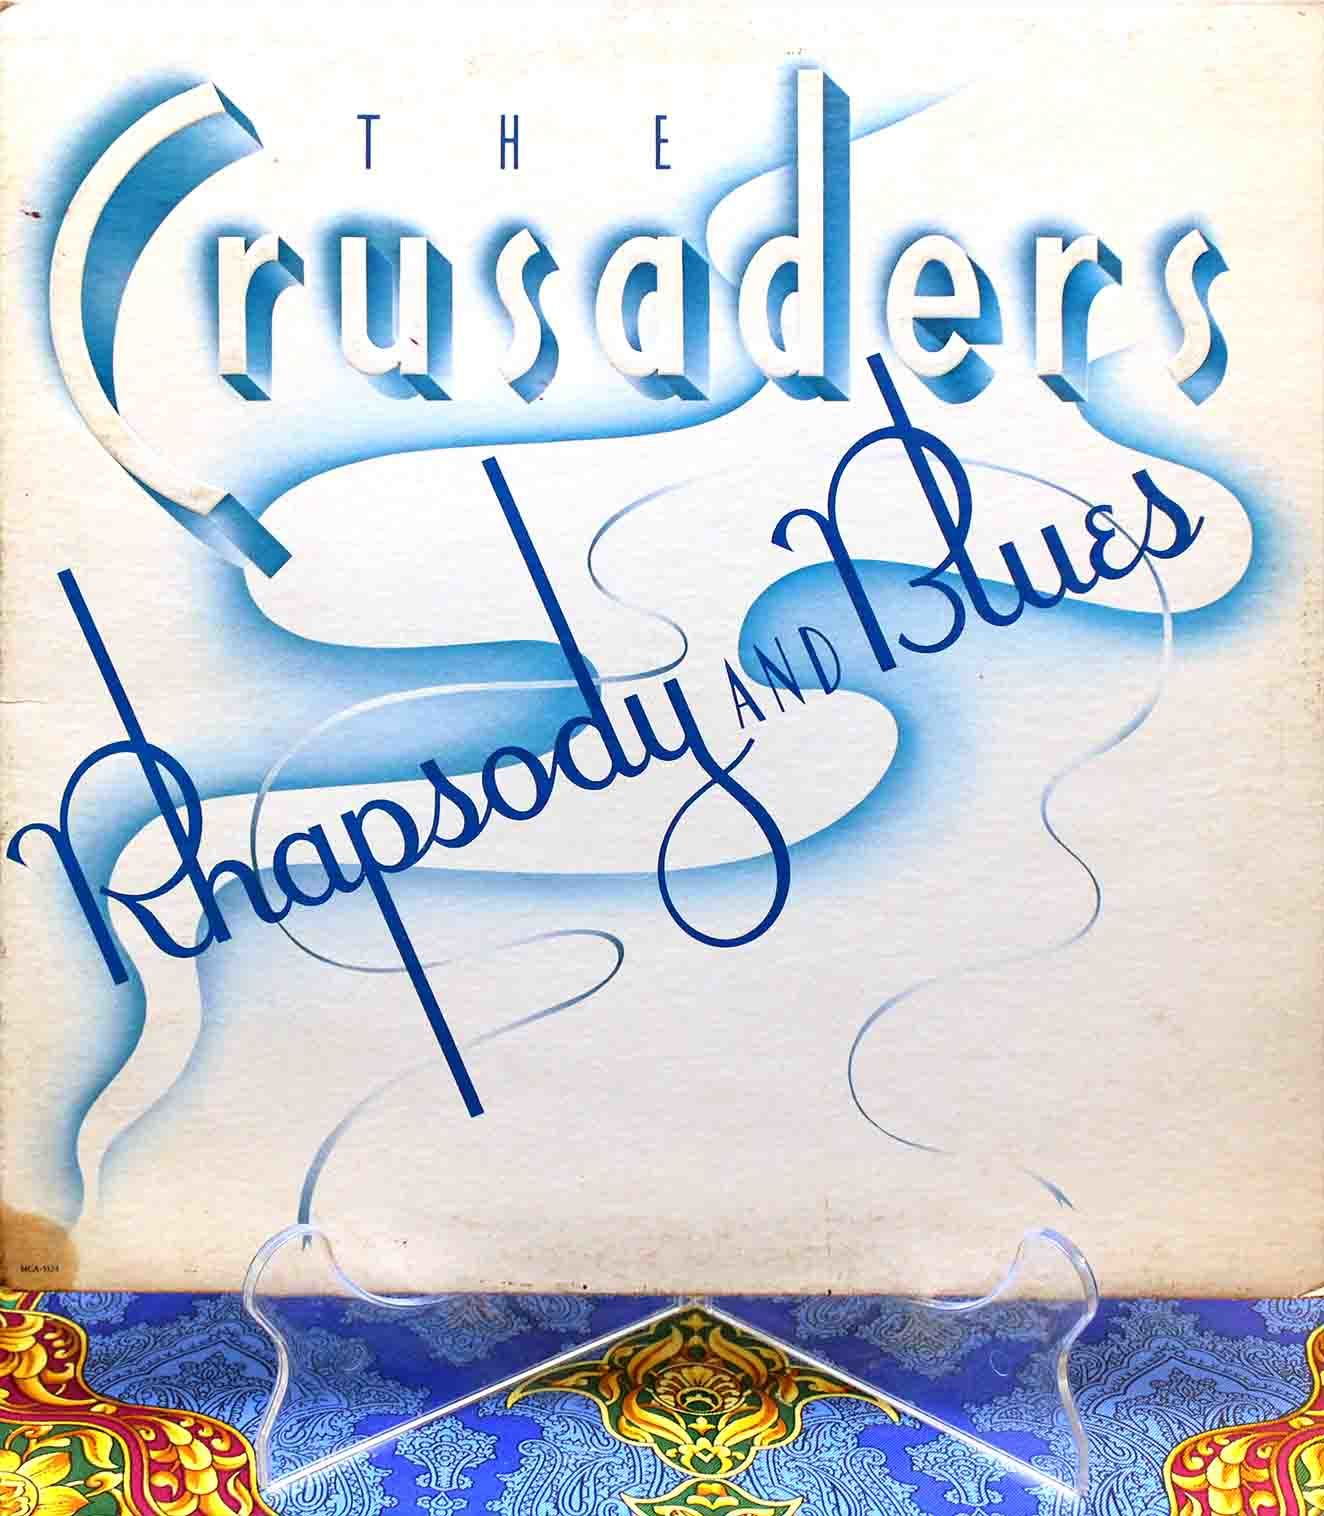 Crusaders – Rhapsody And Blues 01